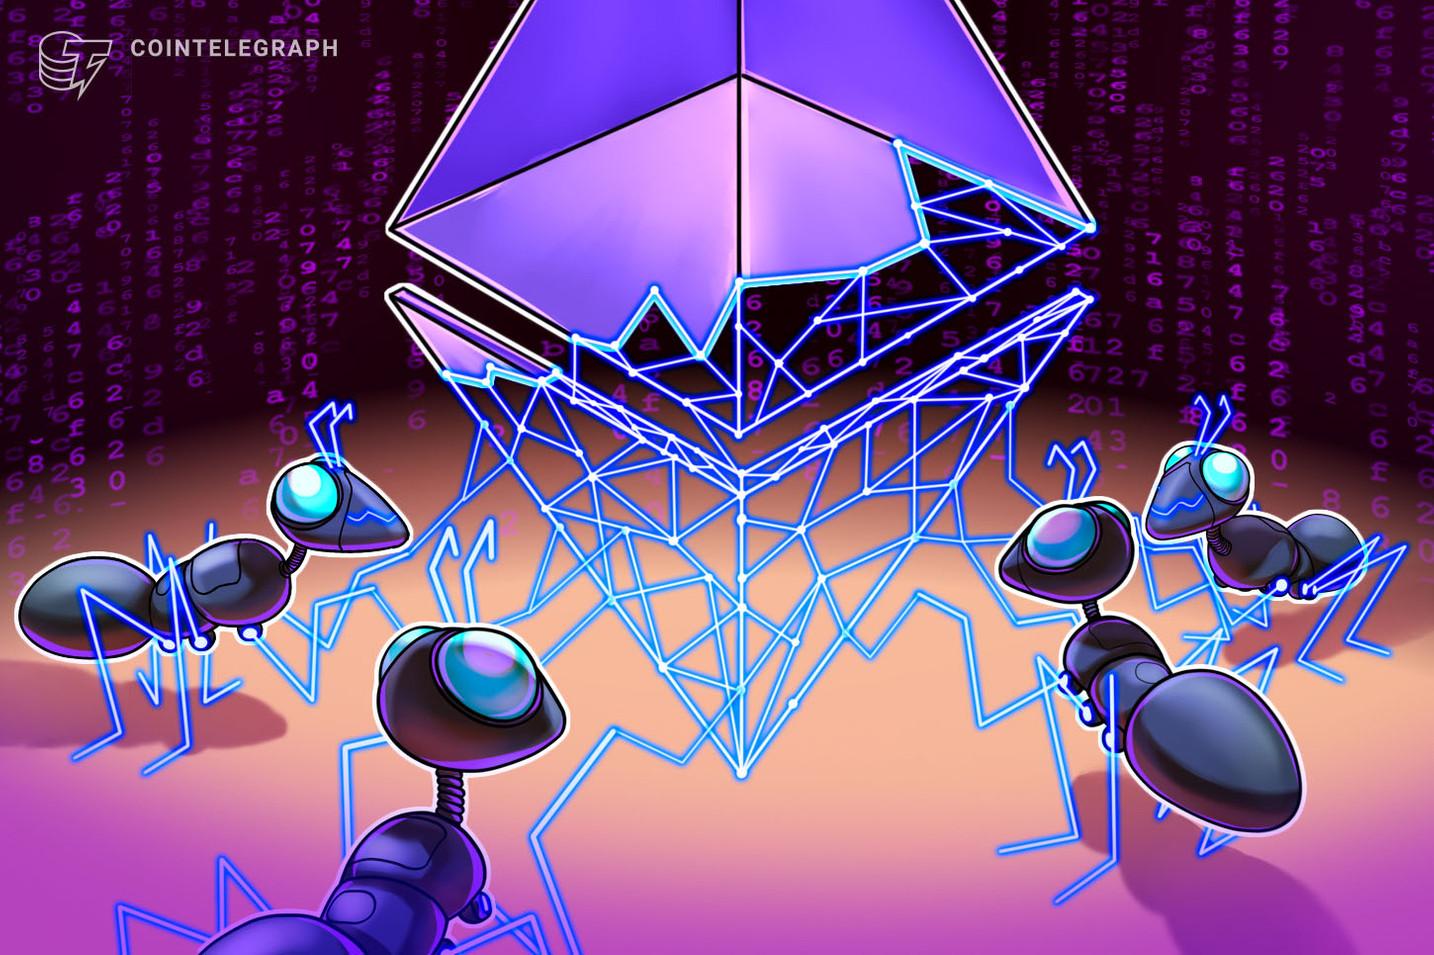 Ethereum-based market platform unveils a new DAO